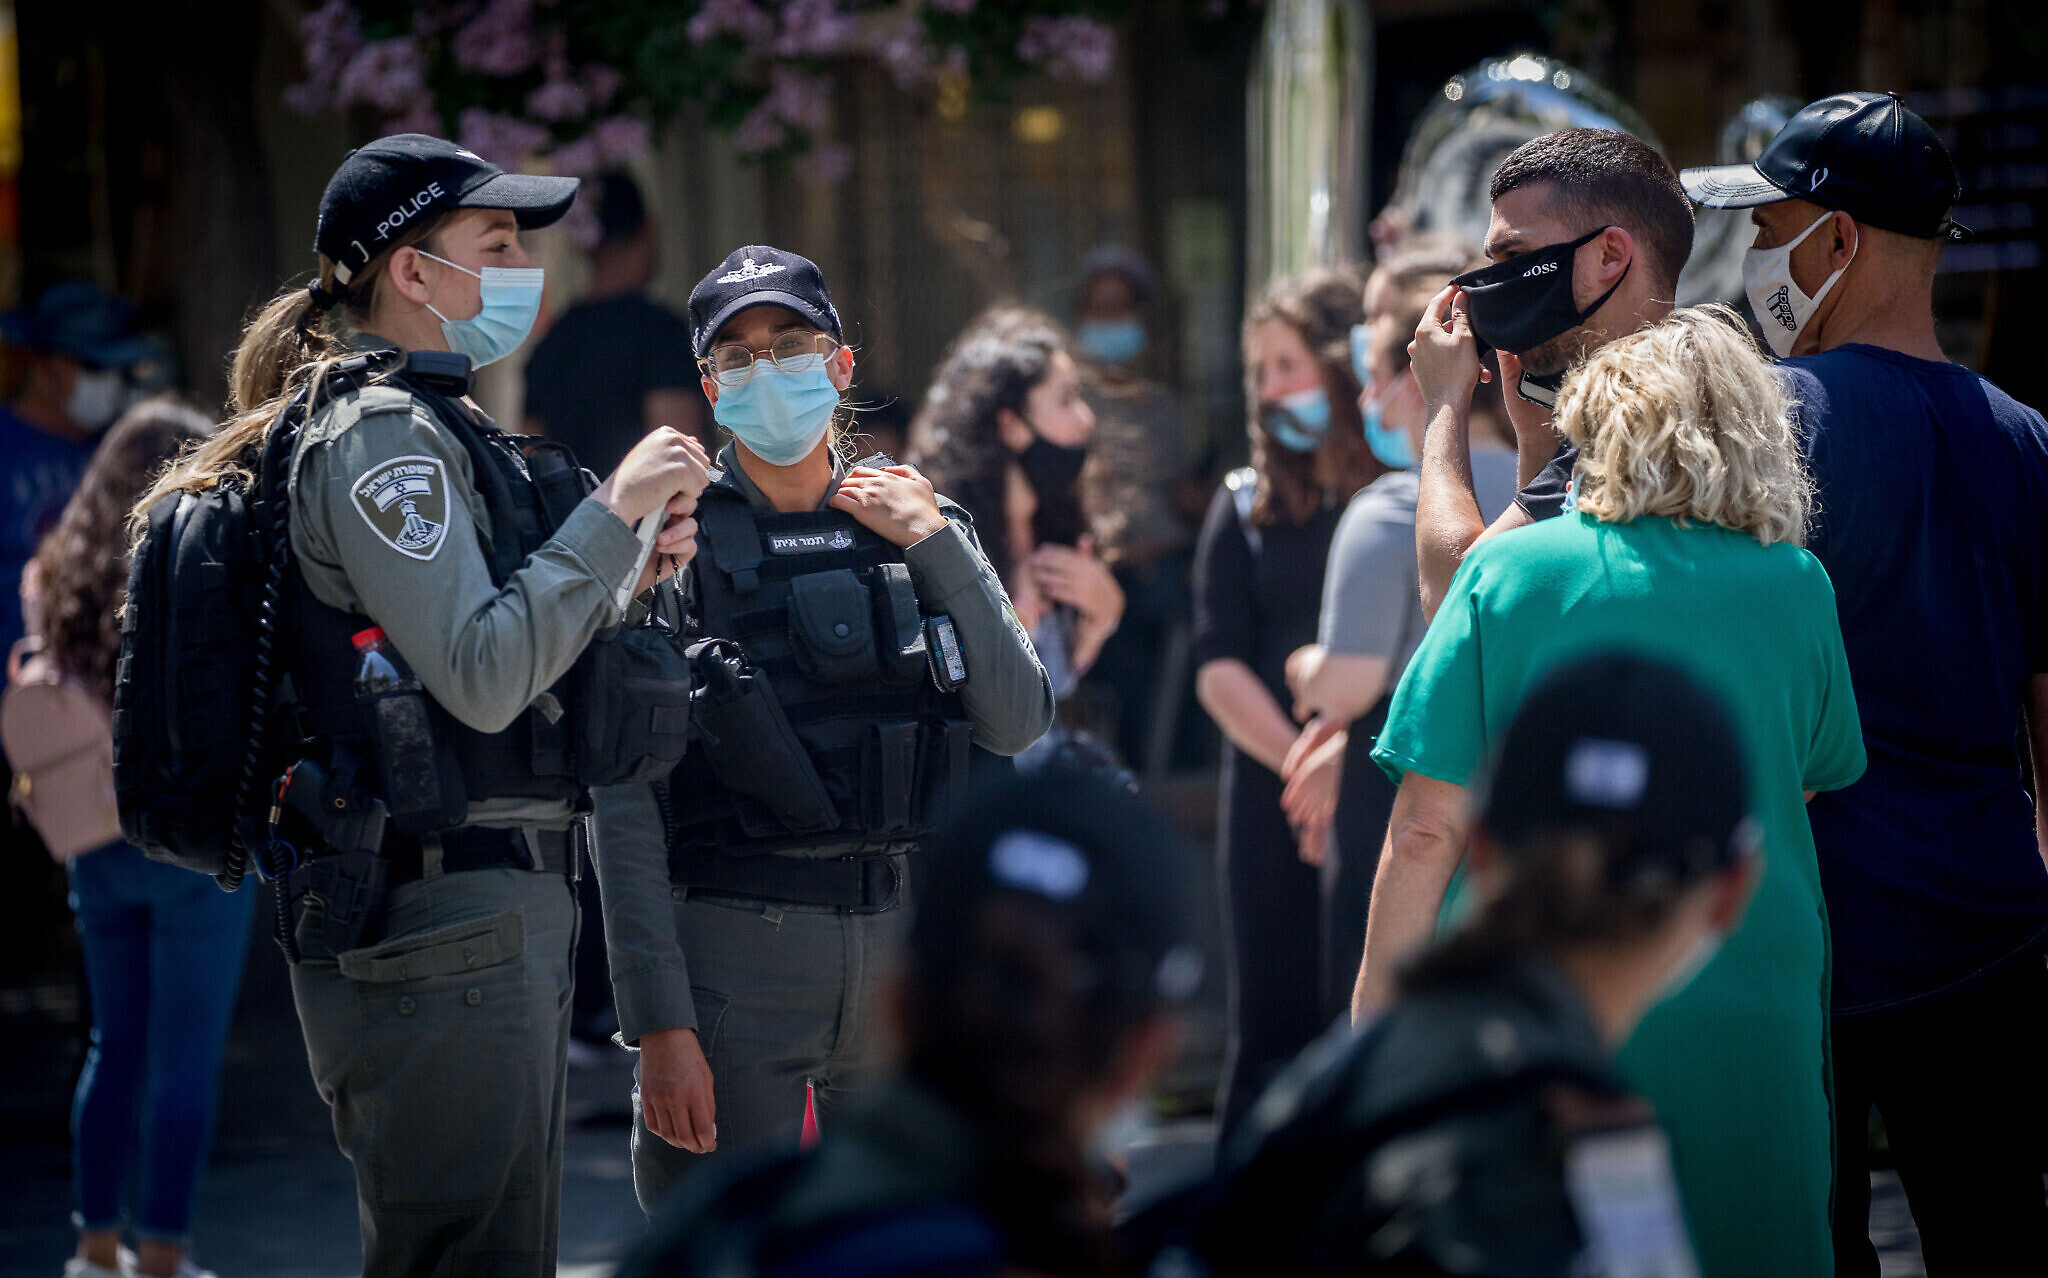 Border police officers check adherence to emergency regulations in Jerusalem, July 6, 2020 (Yonatan Sindel/Flash90)